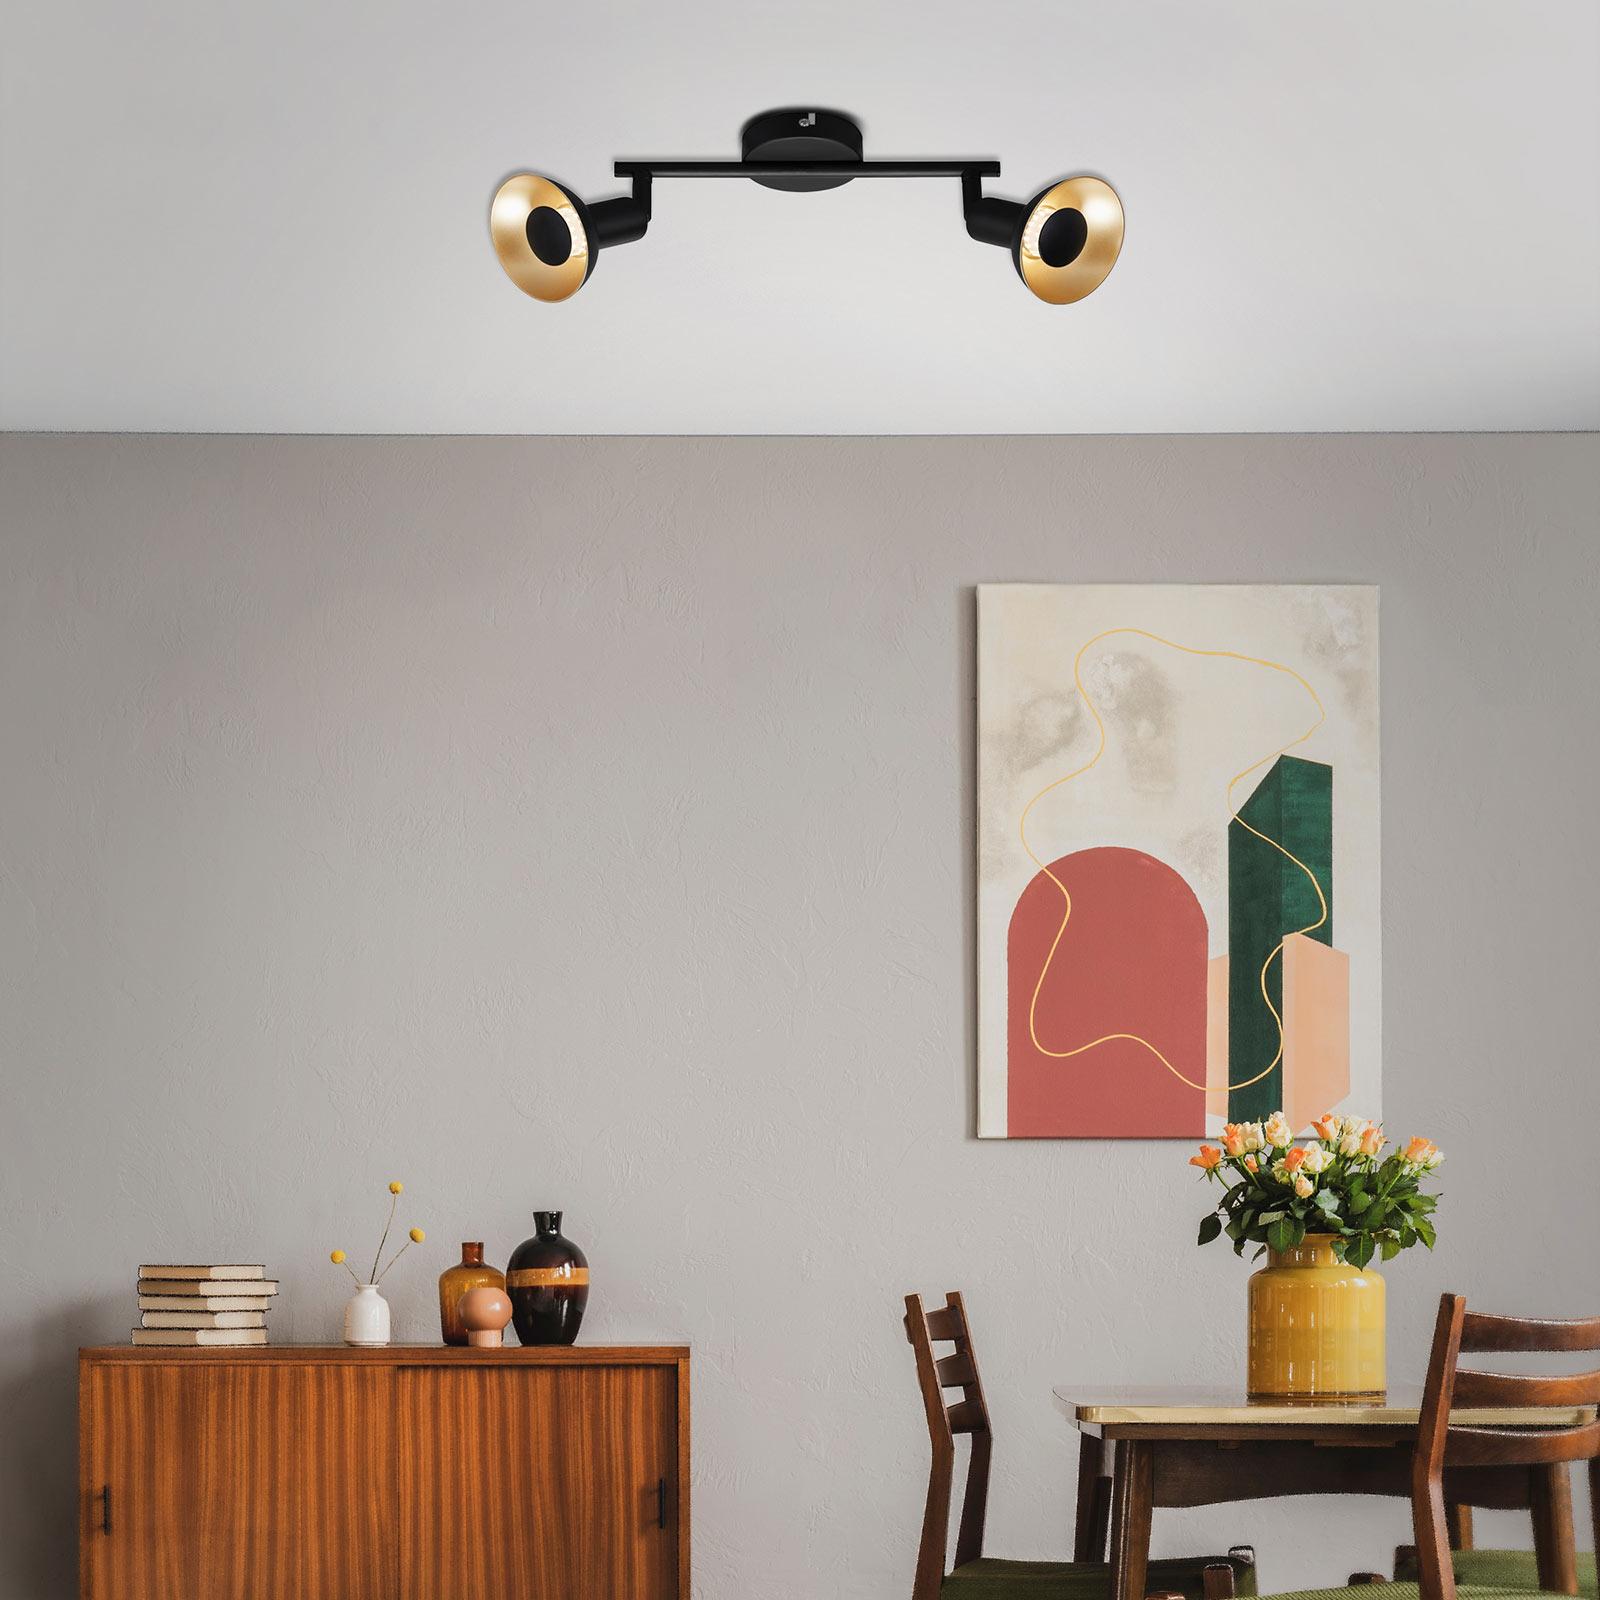 LED plafondlamp Kukui, 2-lamps